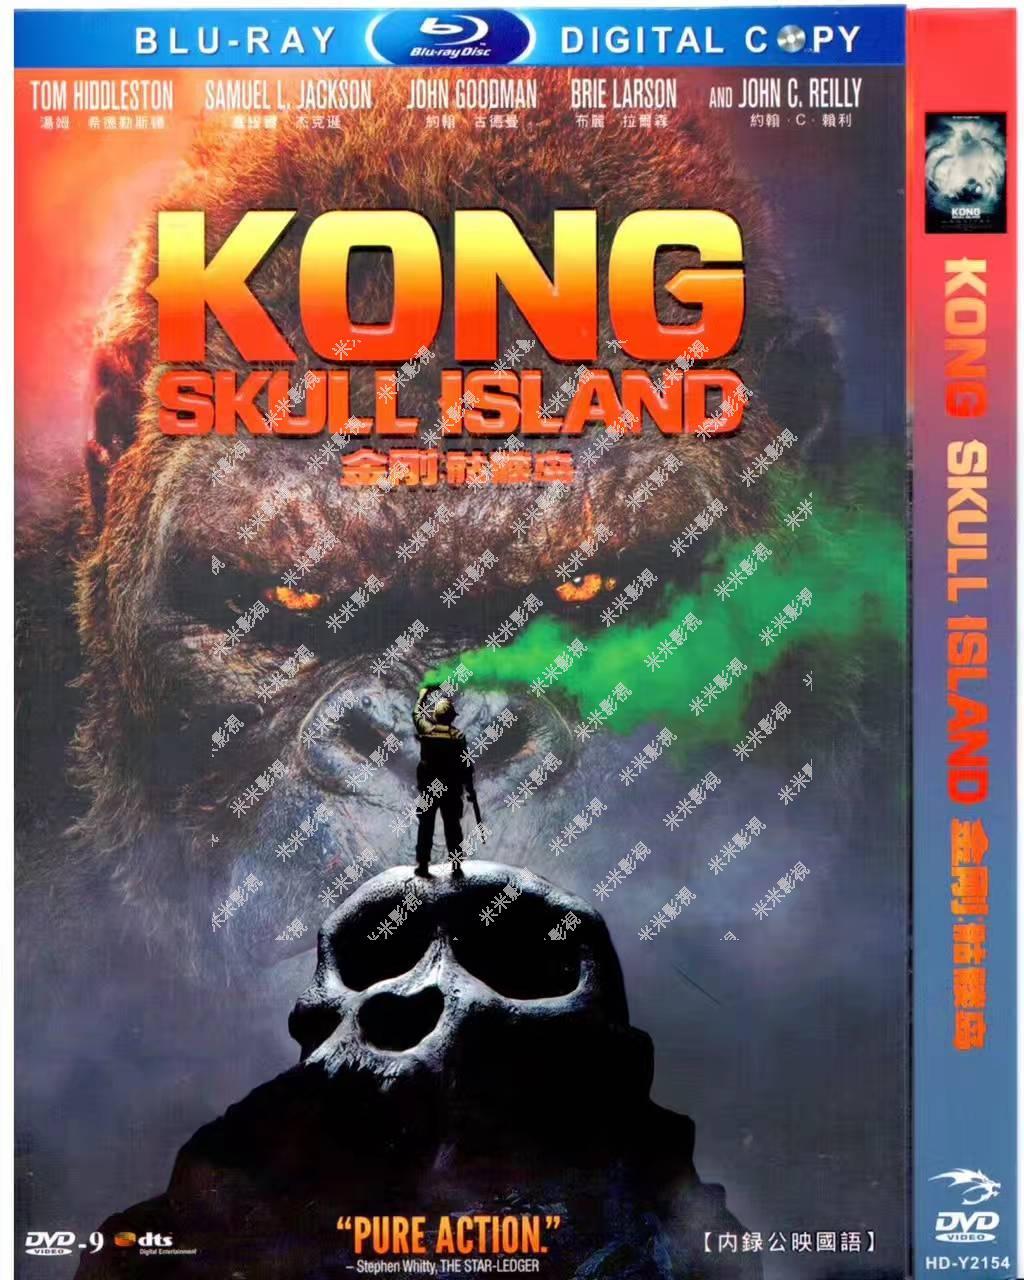 金刚:骷髅岛 kong: skull island (2017) dvd